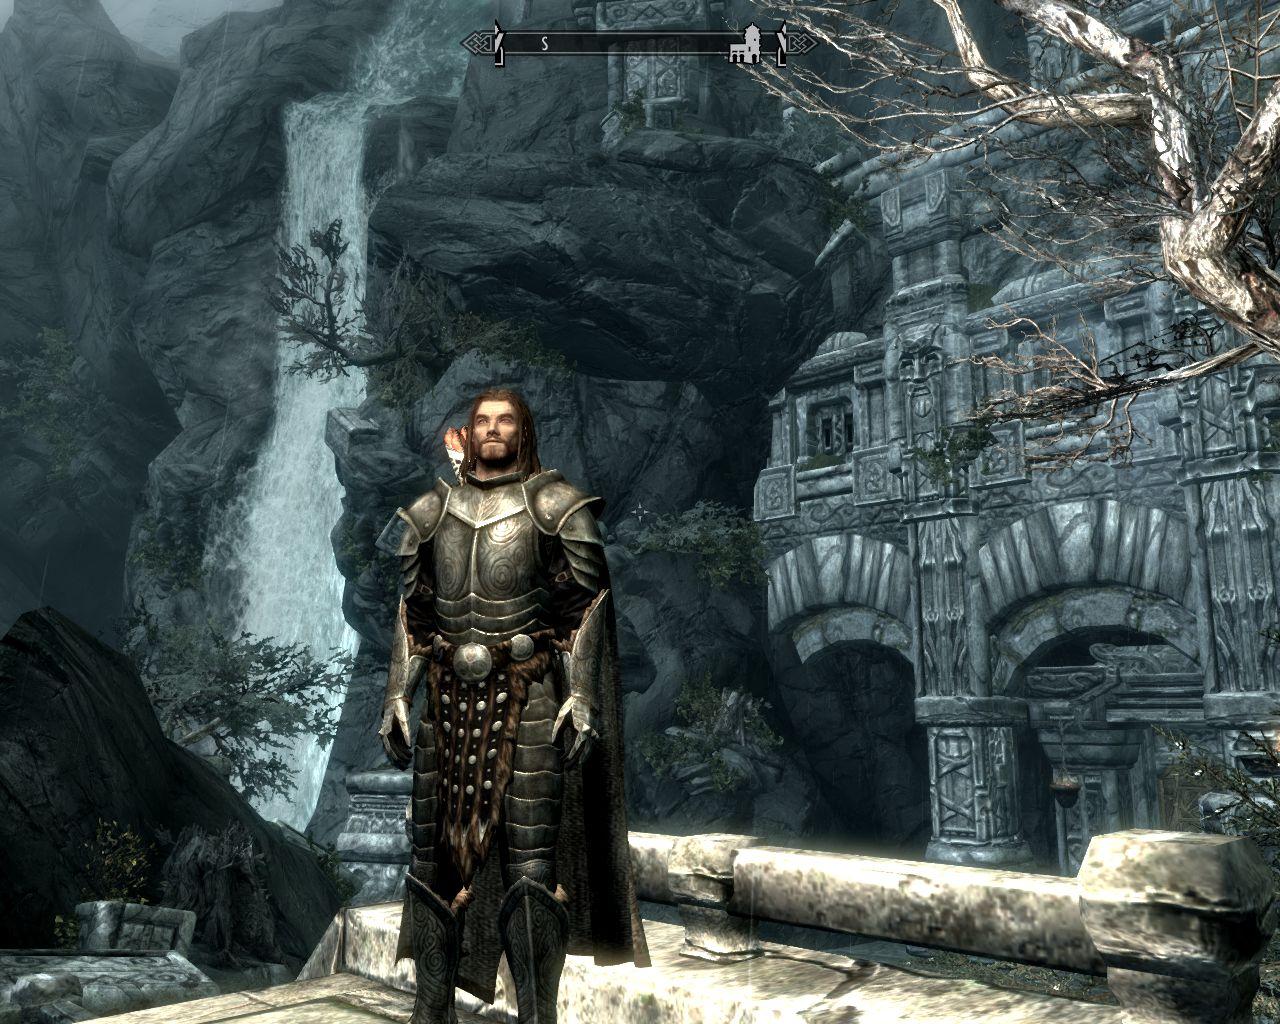 enb2013_1_20_4_19_28.jpg - Elder Scrolls 5: Skyrim, the